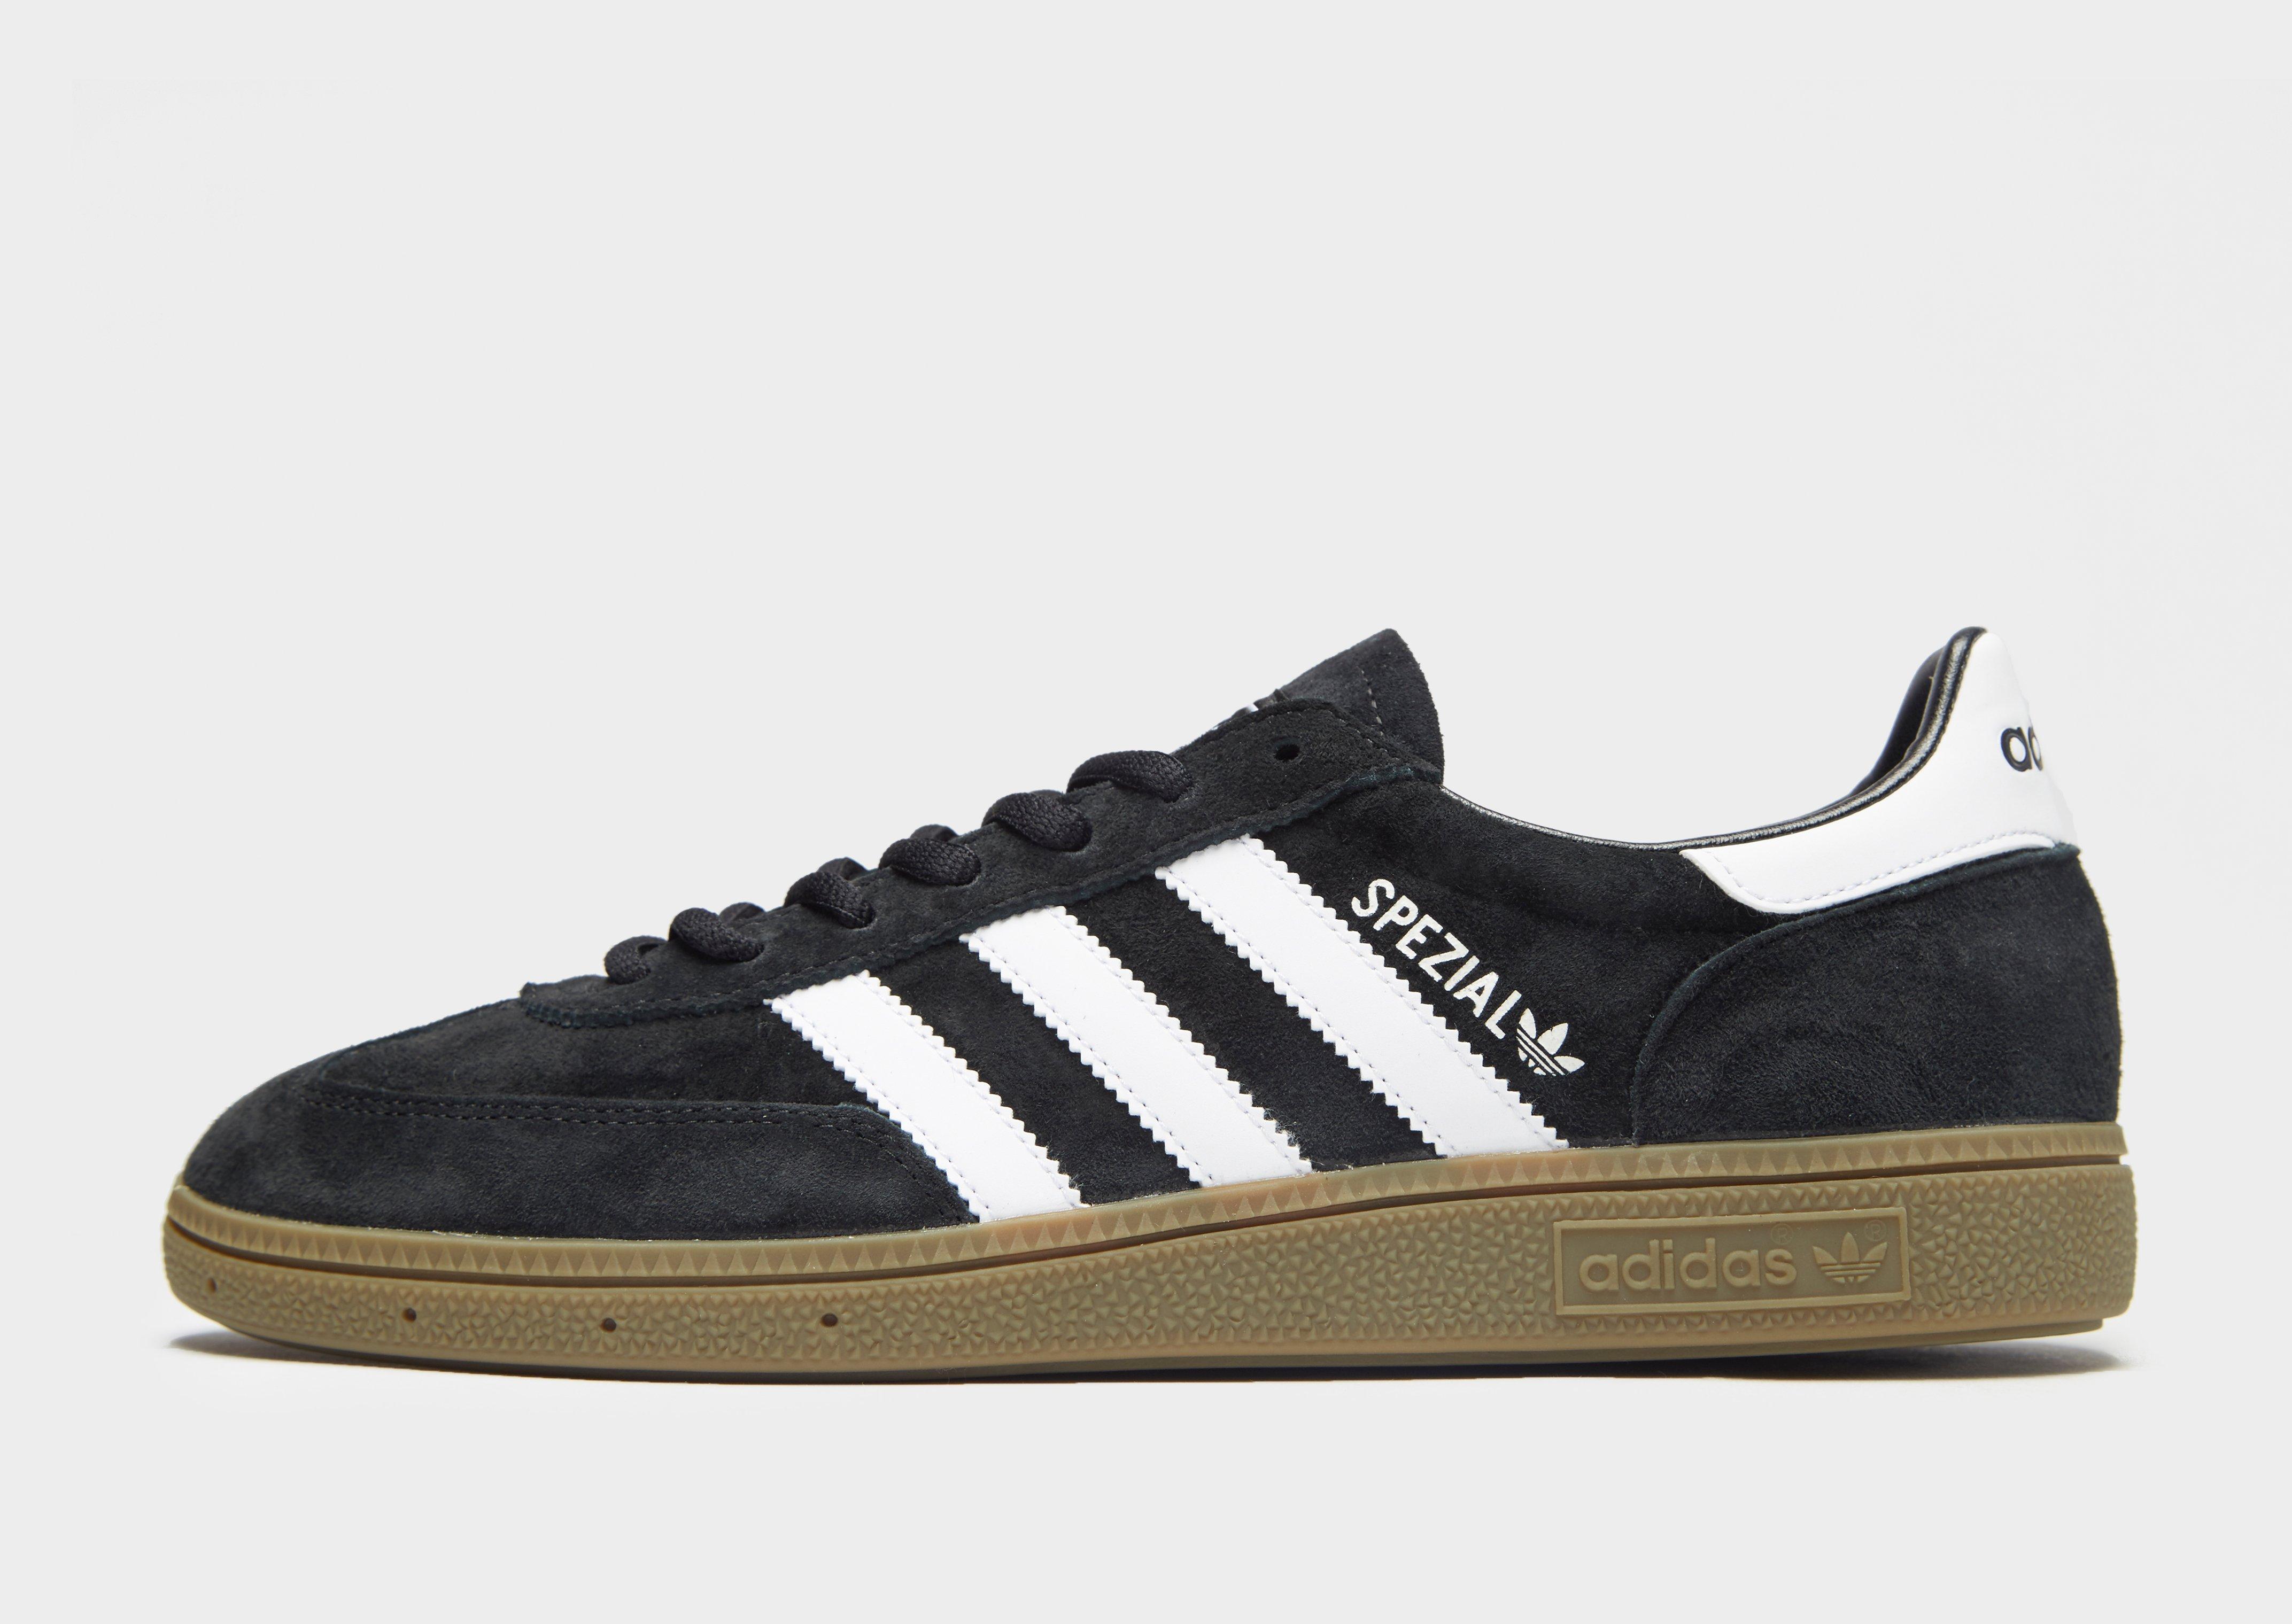 01bee5d63955 Adidas Originals Handball Spezial in Black for Men - Lyst